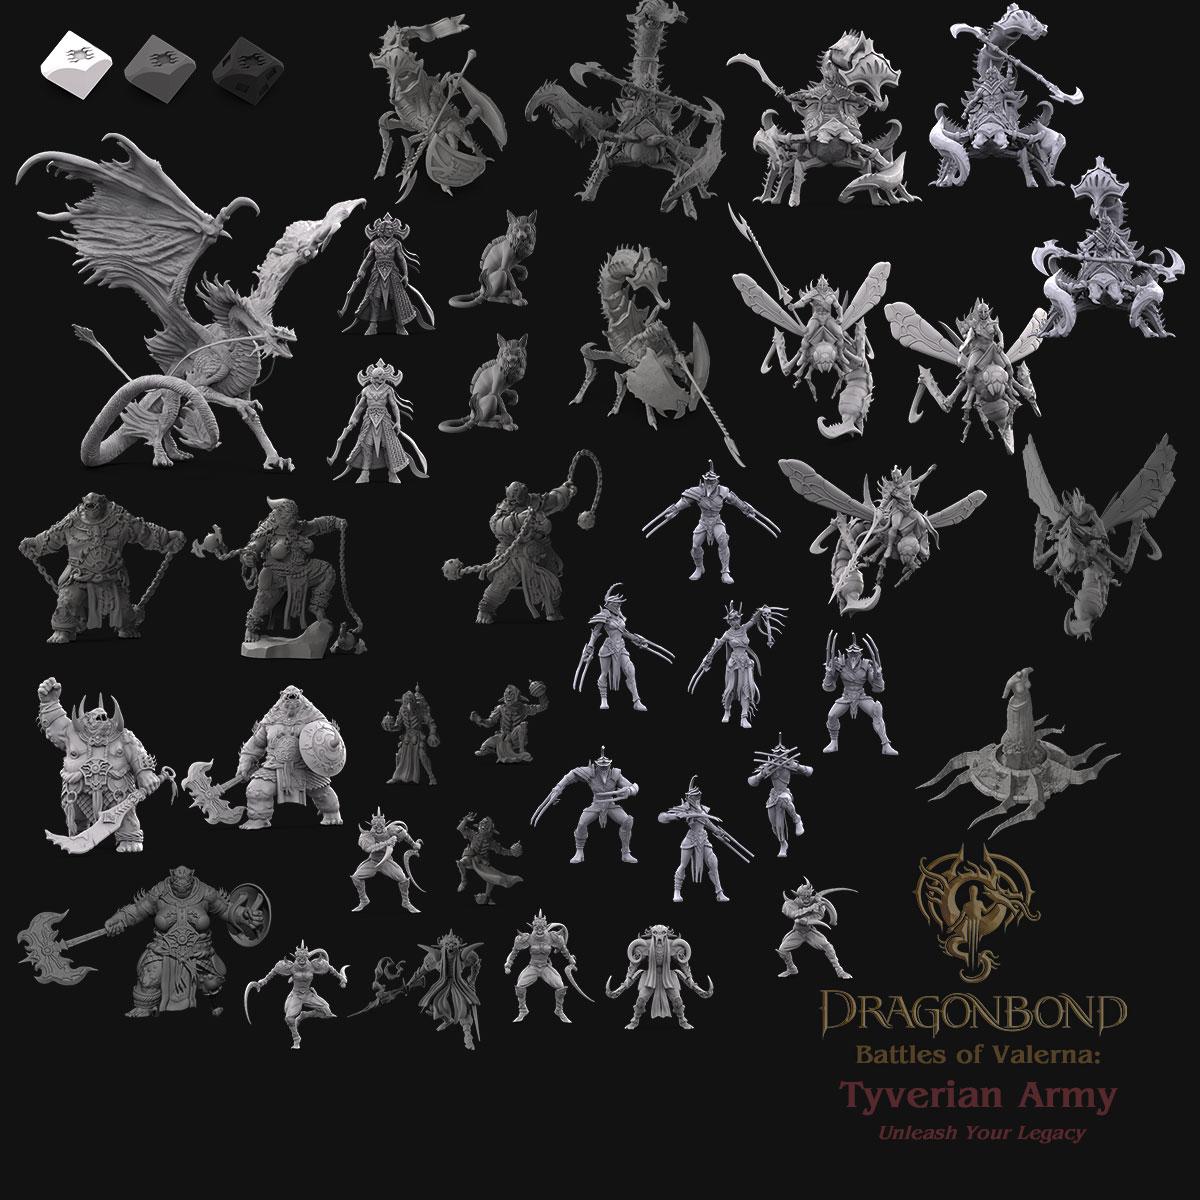 Tyverian Army